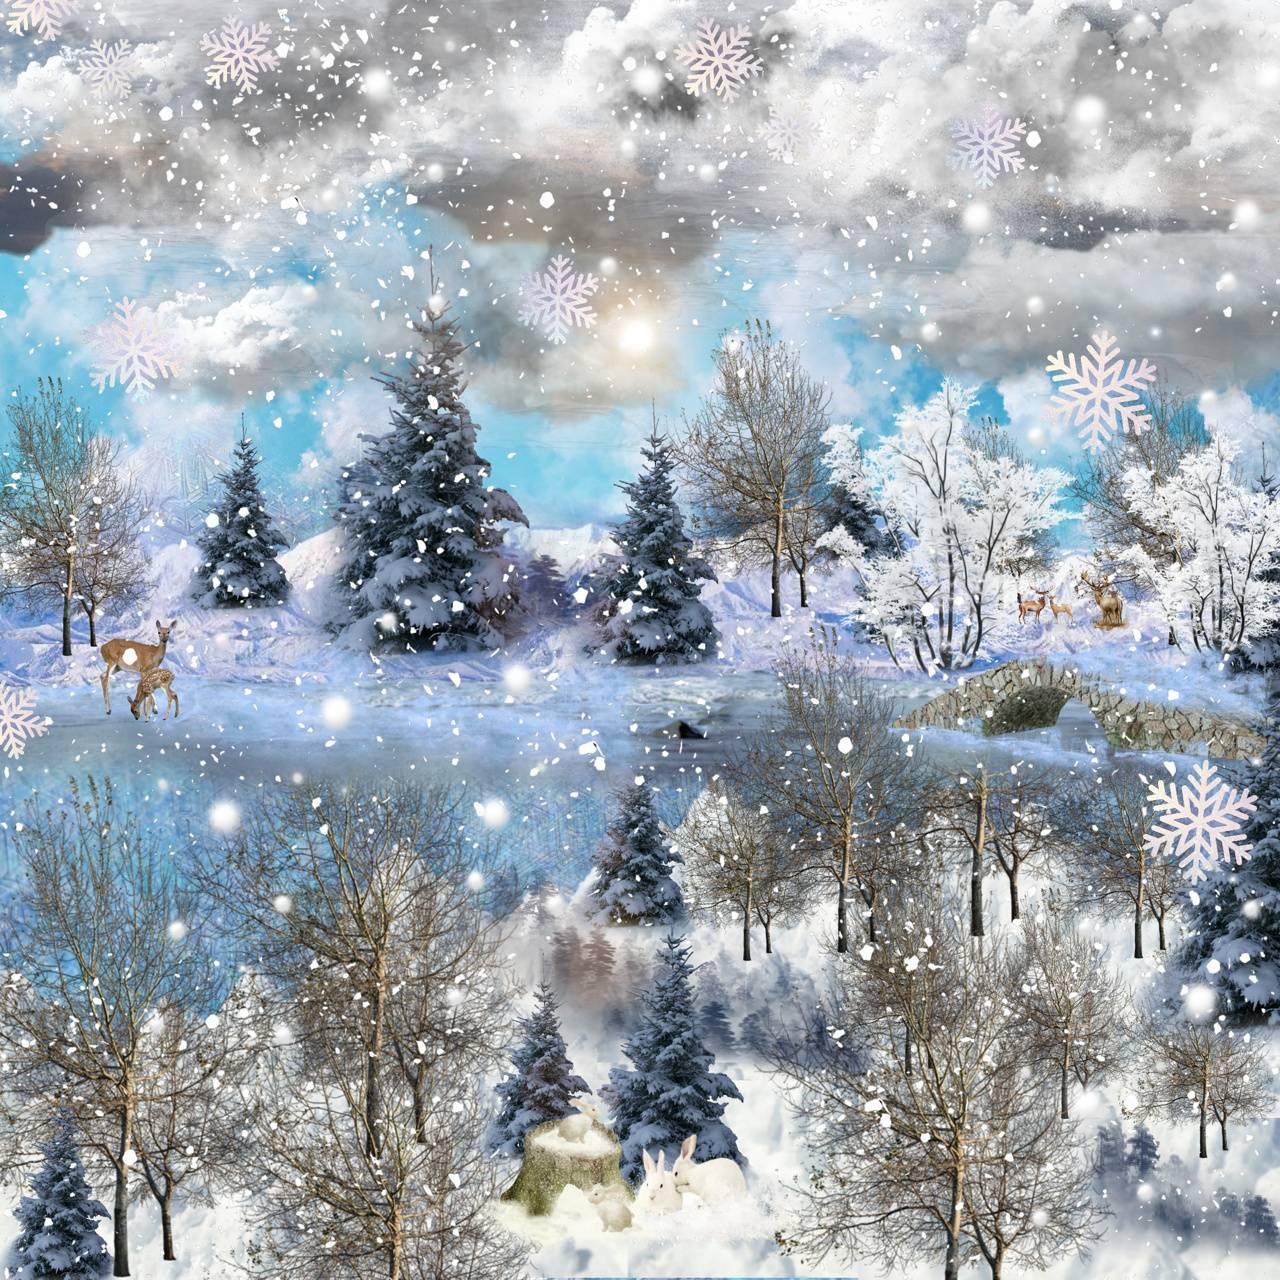 Christmas senery